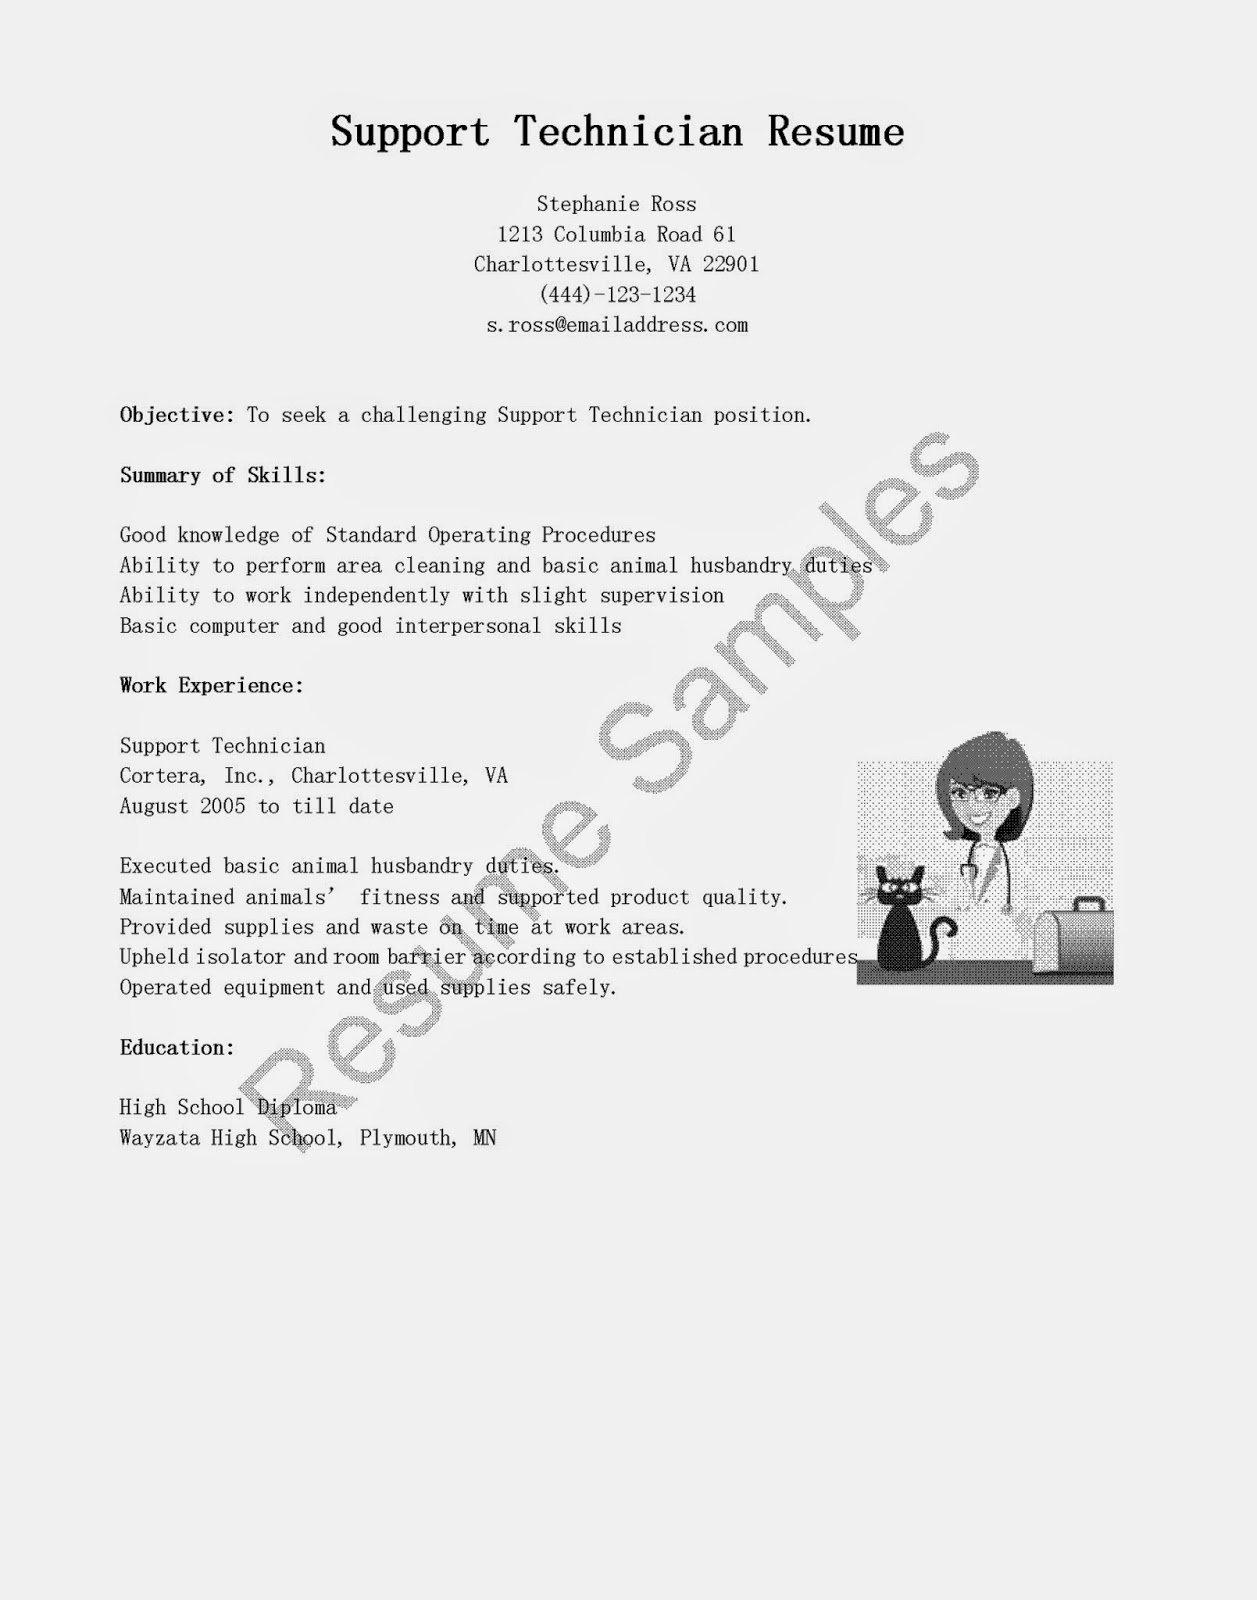 Resume Samples Support Technician Resume Sample